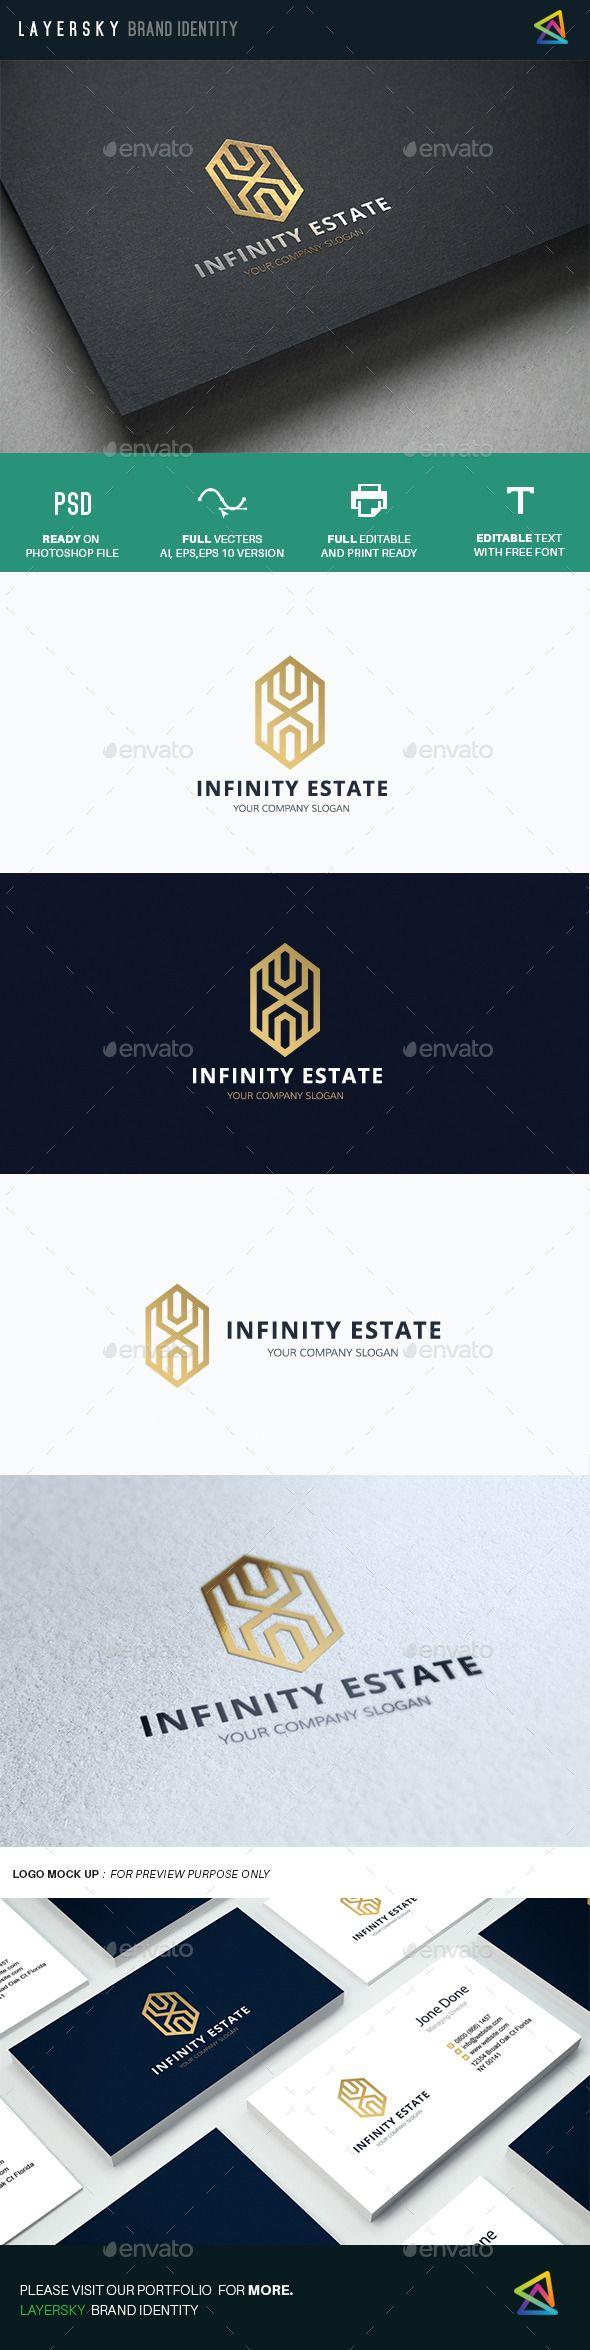 Infinity Real Estate Logo Template #design #logotype Download: http://graphicriver.net/item/infinity-real-estate/12646951?ref=ksioks